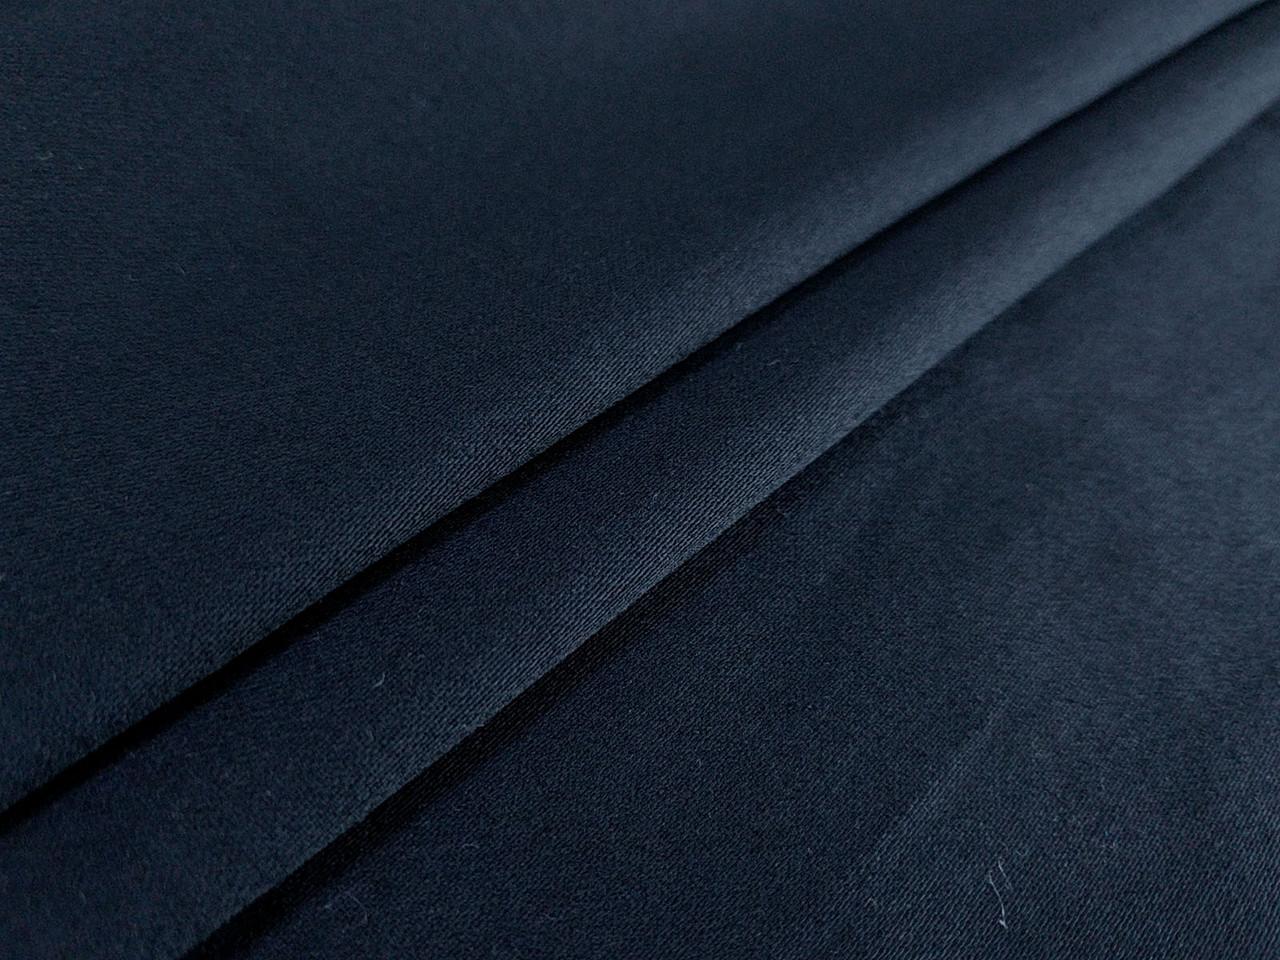 Коттон сатин плотный, темно-синий